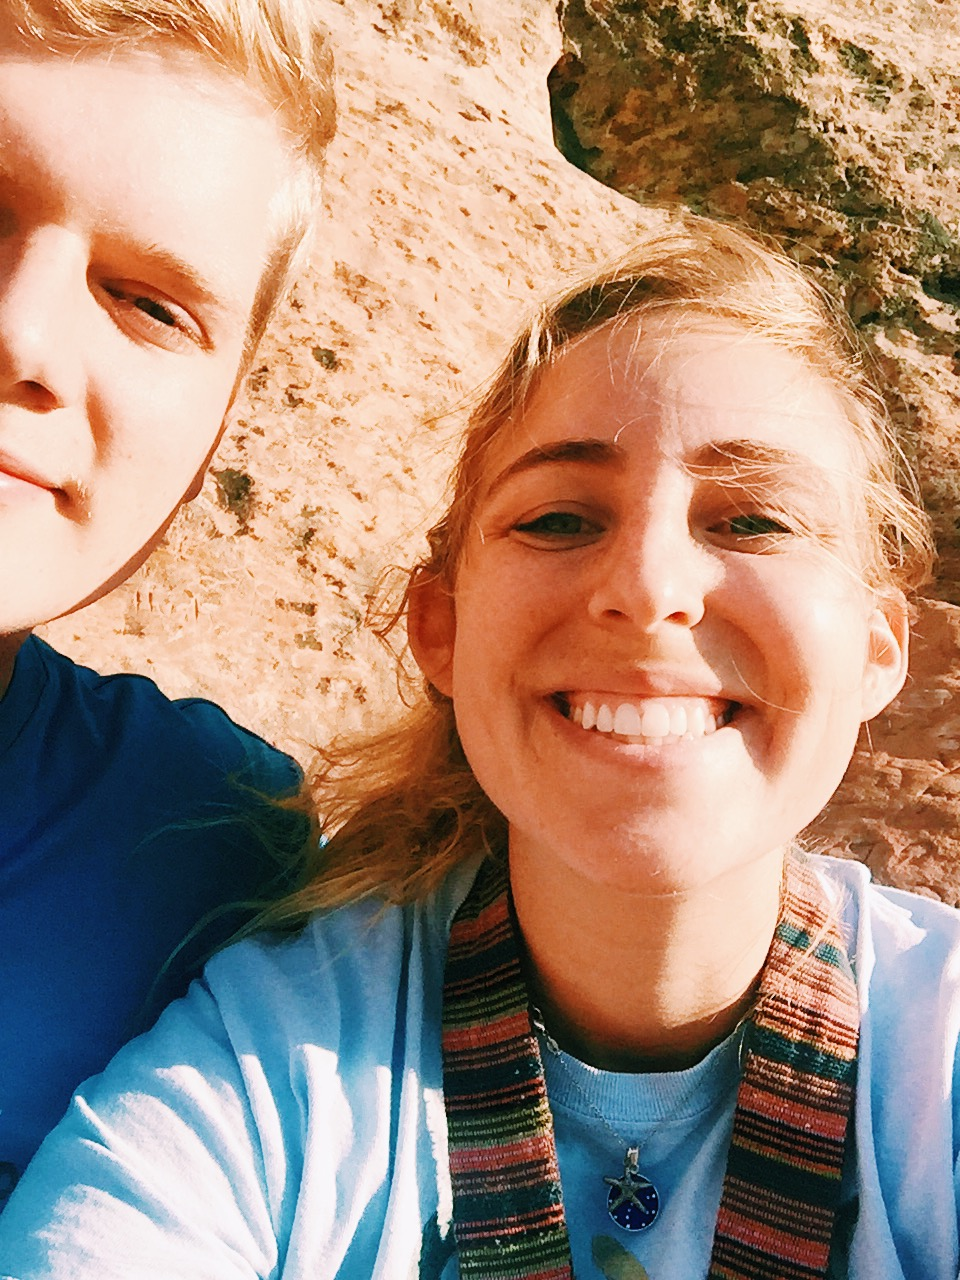 & took a trip to Moab.